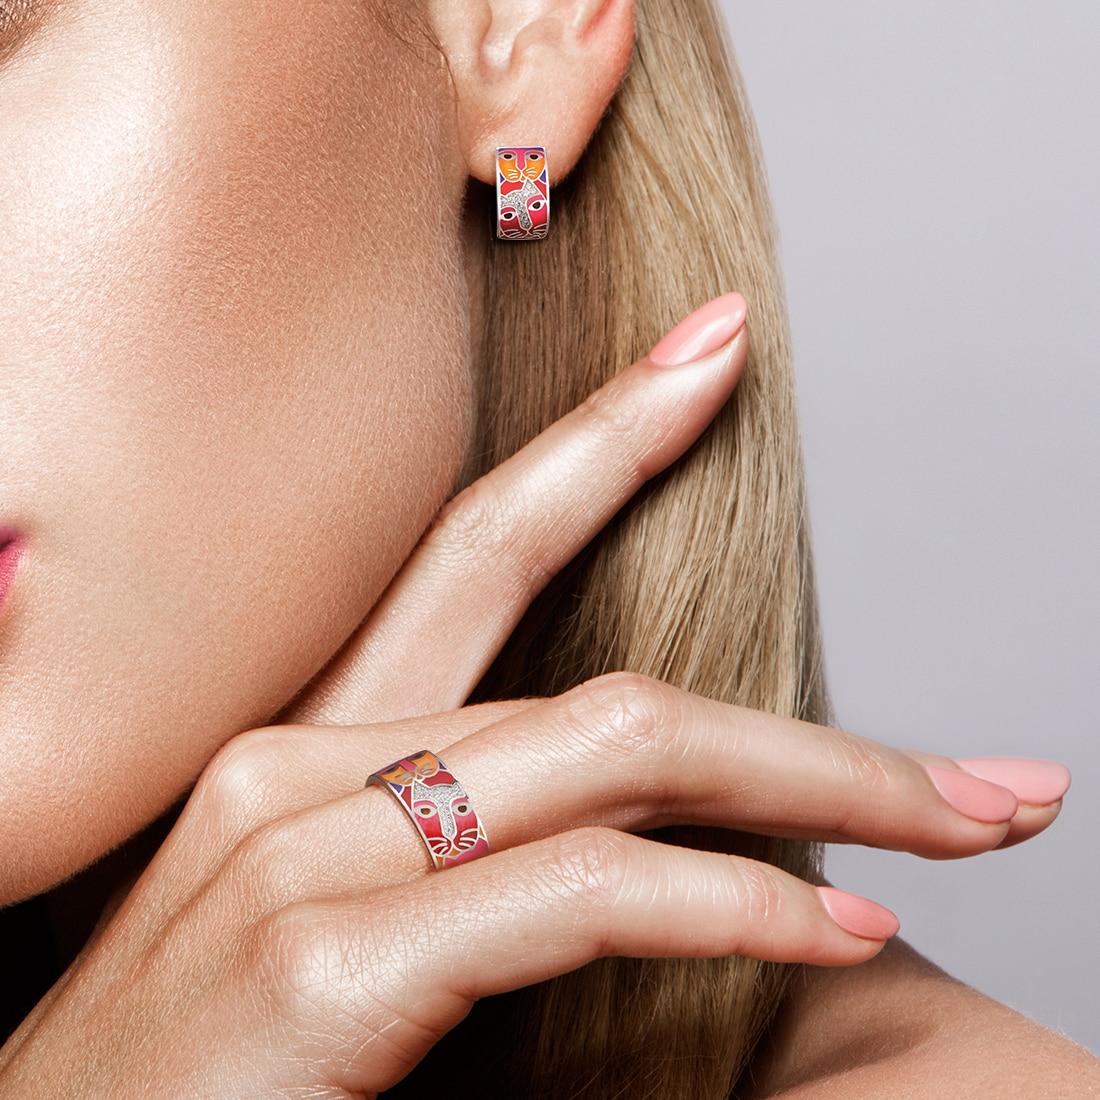 SANTUZZA Pure 925 Sterling Silver Jewelry Set For Woman White CZ Red Cat Enamel Ring Earrings Set Lovely Fine Jewelry Handmade